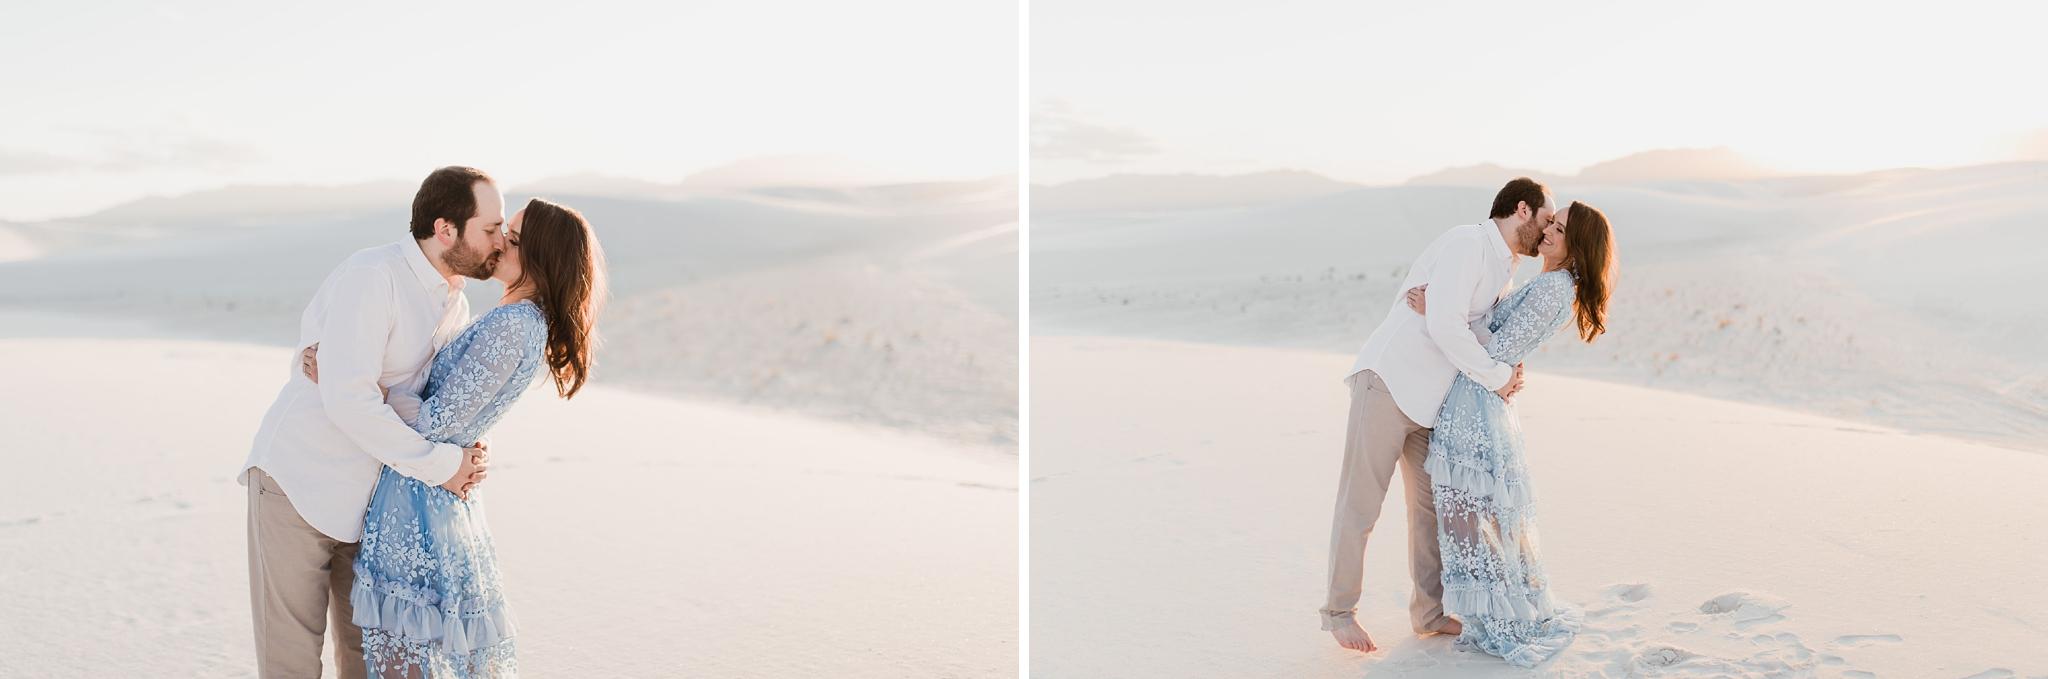 Alicia+lucia+photography+-+albuquerque+wedding+photographer+-+santa+fe+wedding+photography+-+new+mexico+wedding+photographer+-+new+mexico+wedding+-+new+mexico+engagement+-+white+sands+engagement+-+white+sands+national+monument_0034.jpg